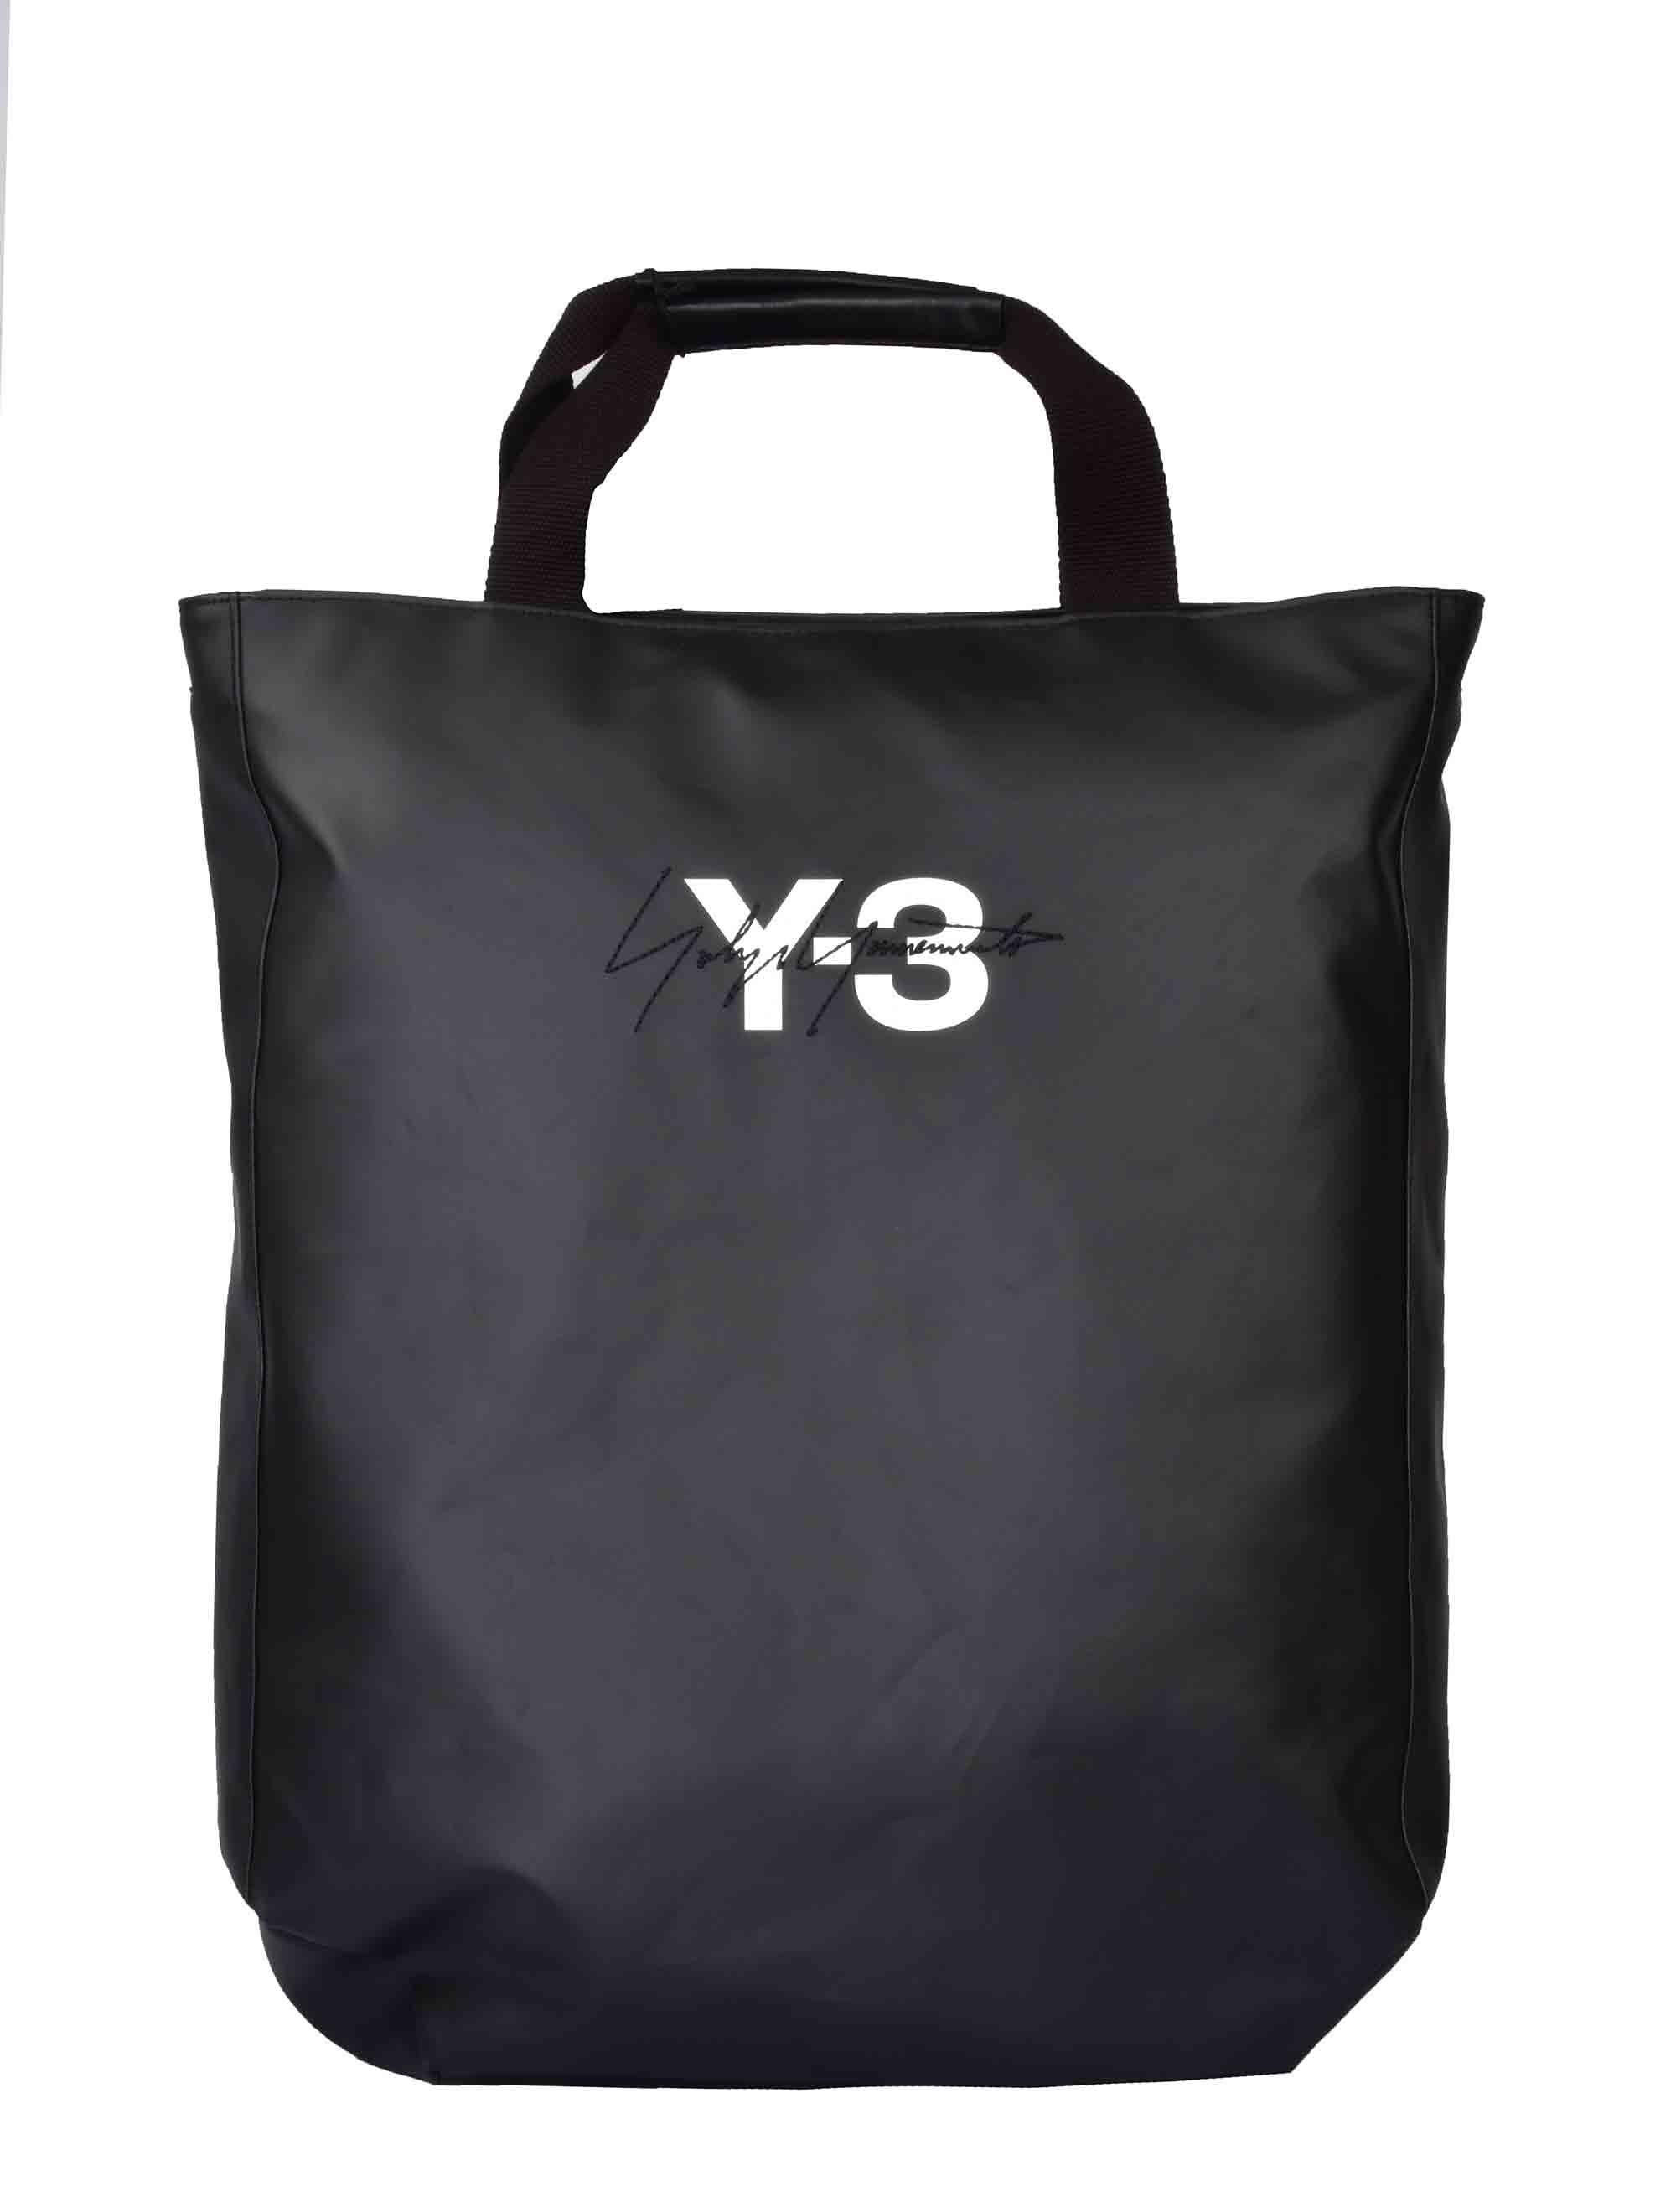 Mimma Ninni – Luxury and Fashion Shopping. Adidas Y-3 Logo Tote Bag ... 6bfdd242b5ebe